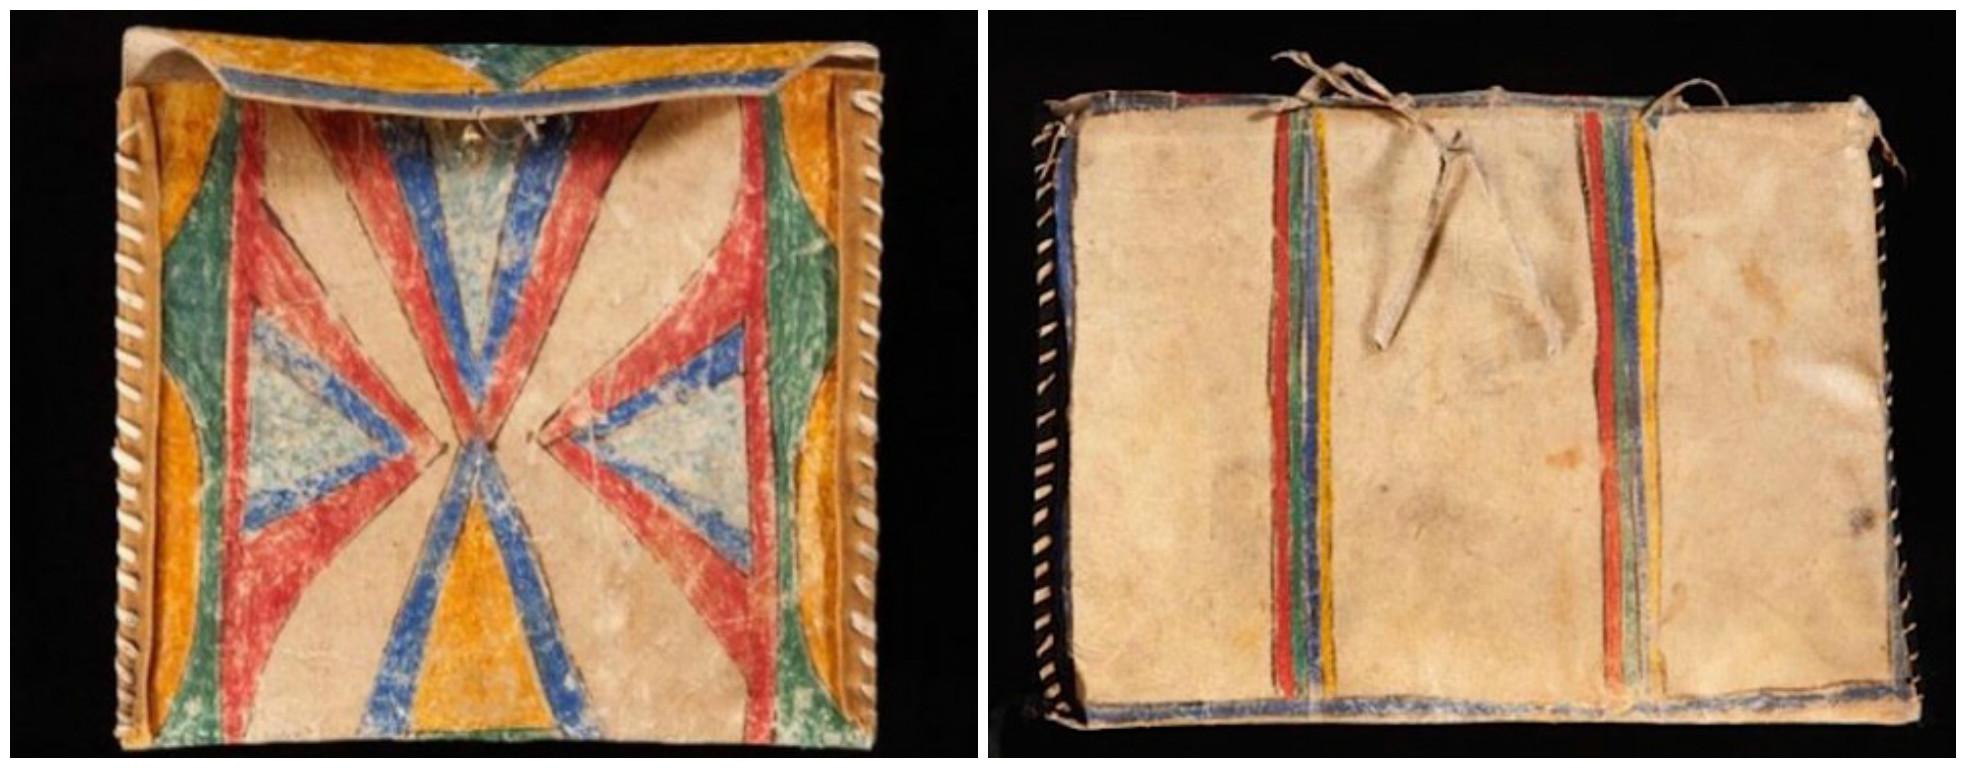 Lakota document-case parfleche, circa 1900. (Courtesy of John Molloy Gallery)